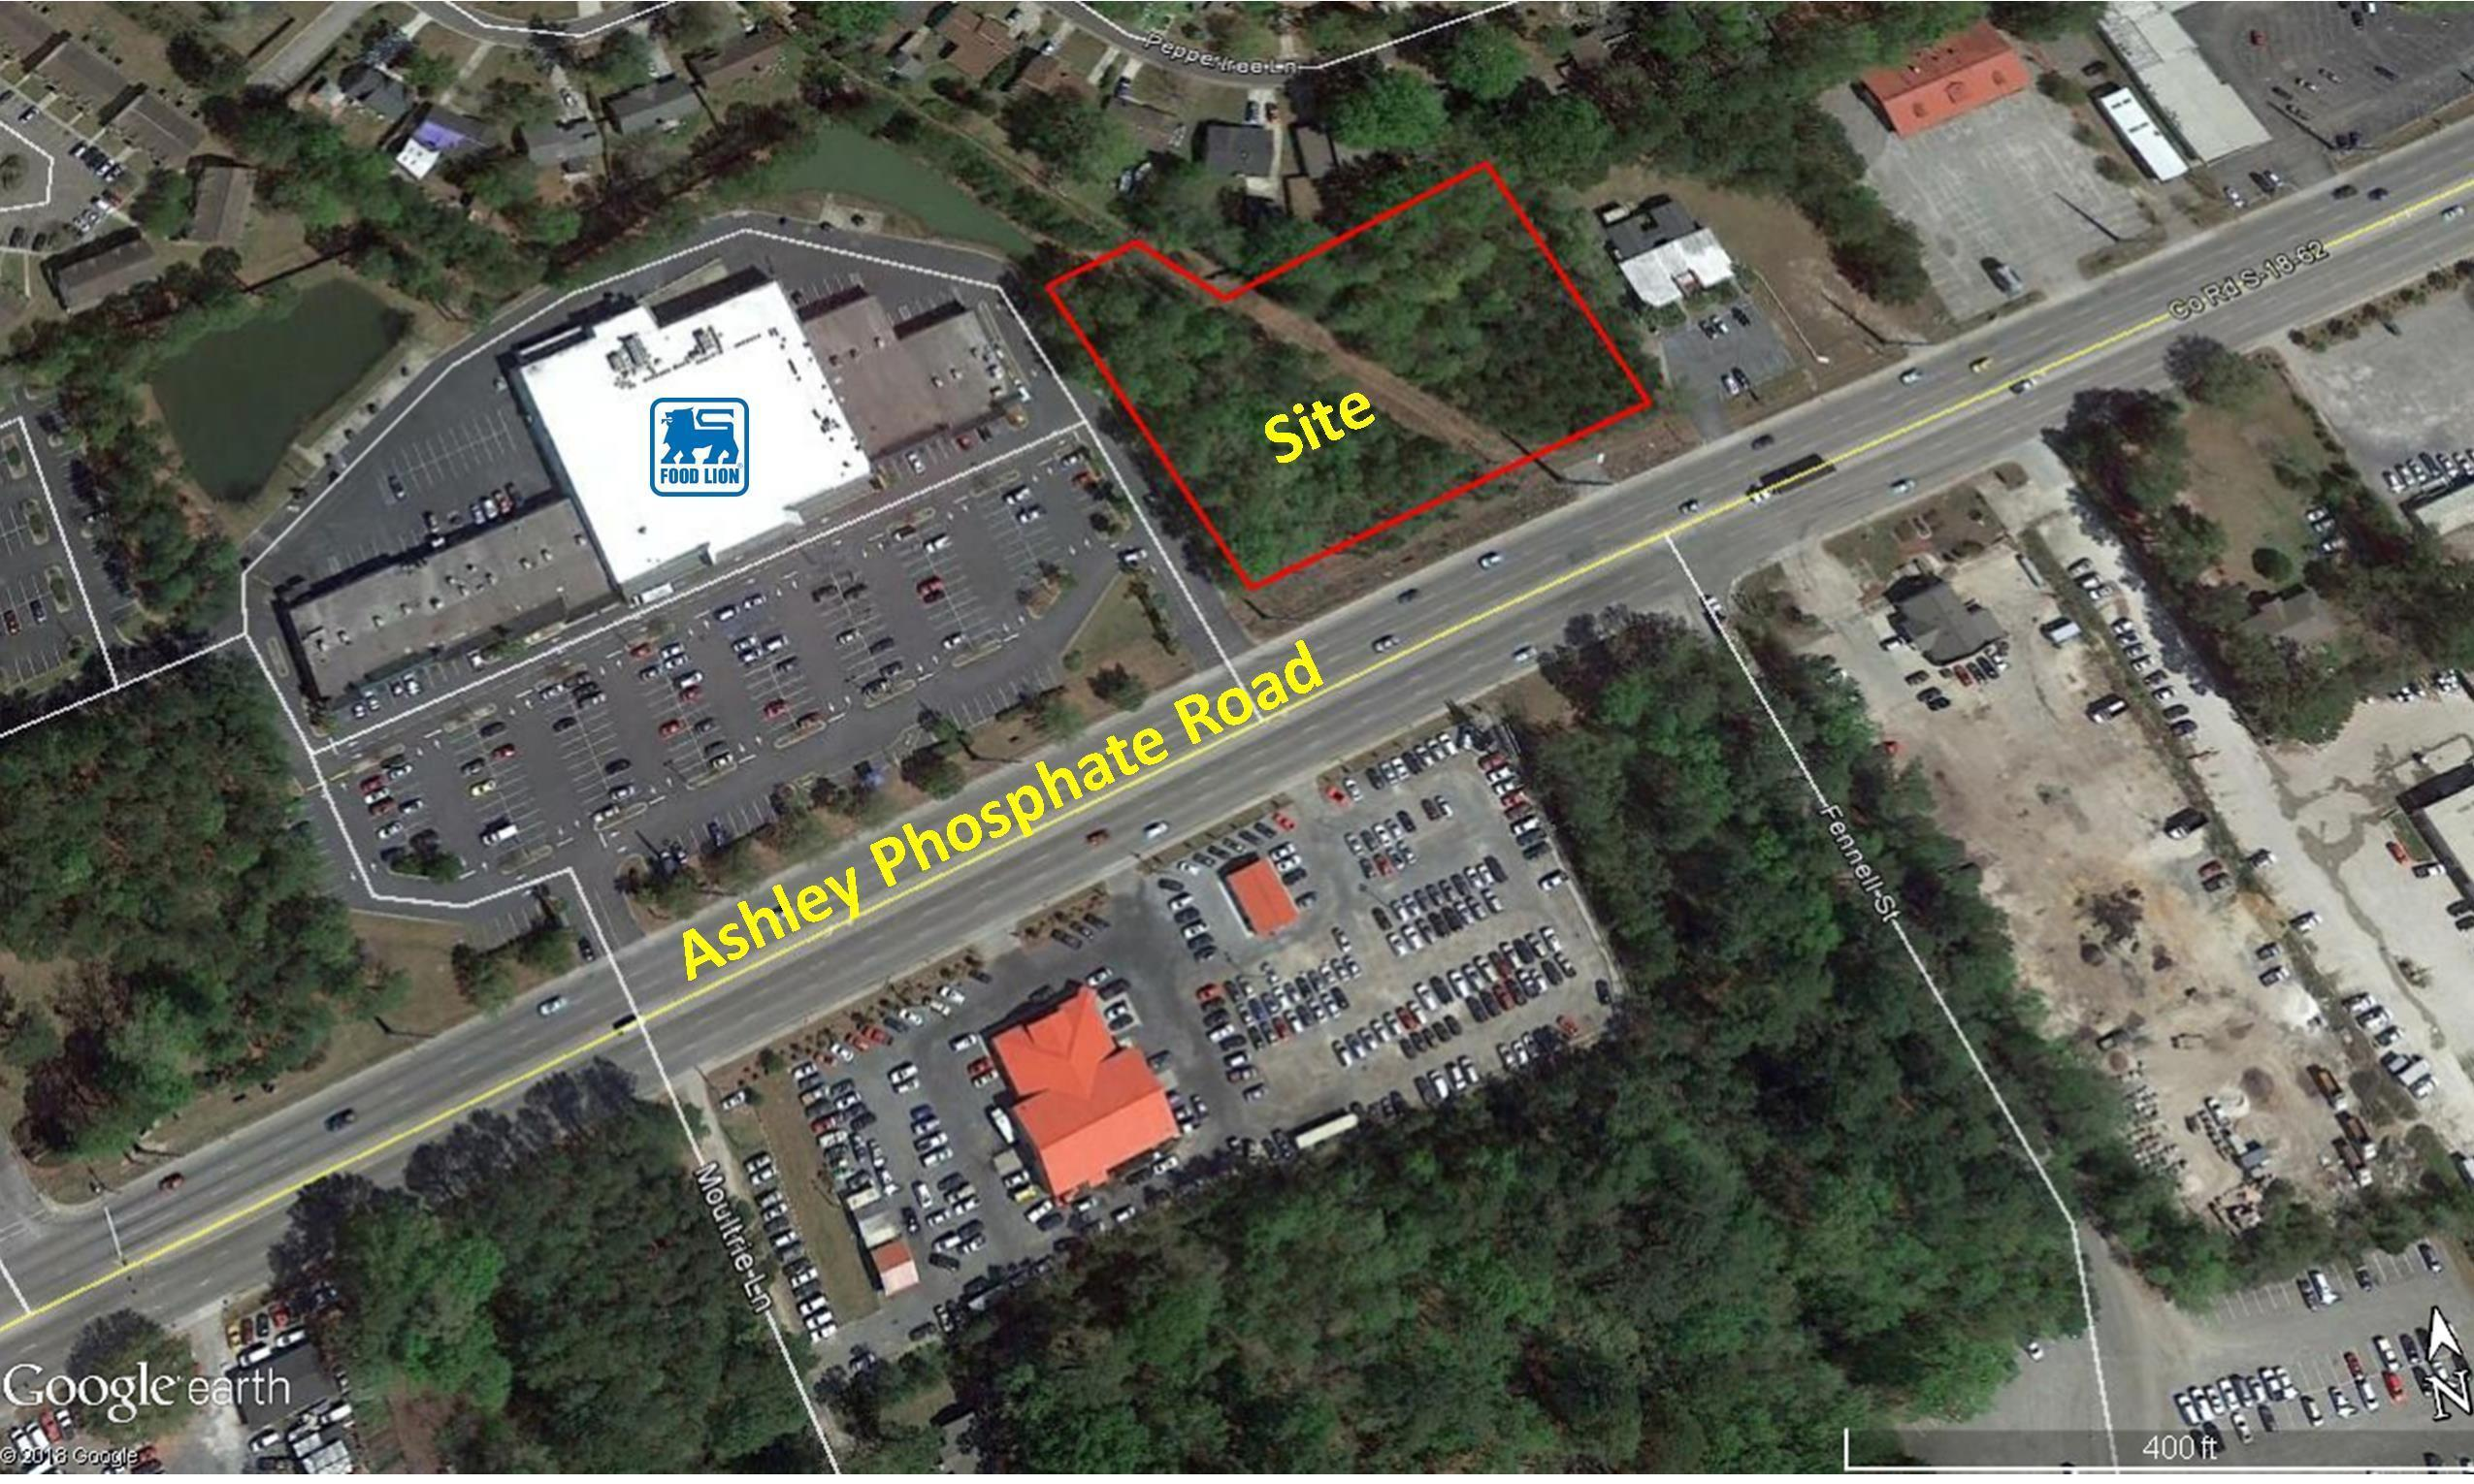 3700 Ashley Phosphate Road North Charleston, SC 29418